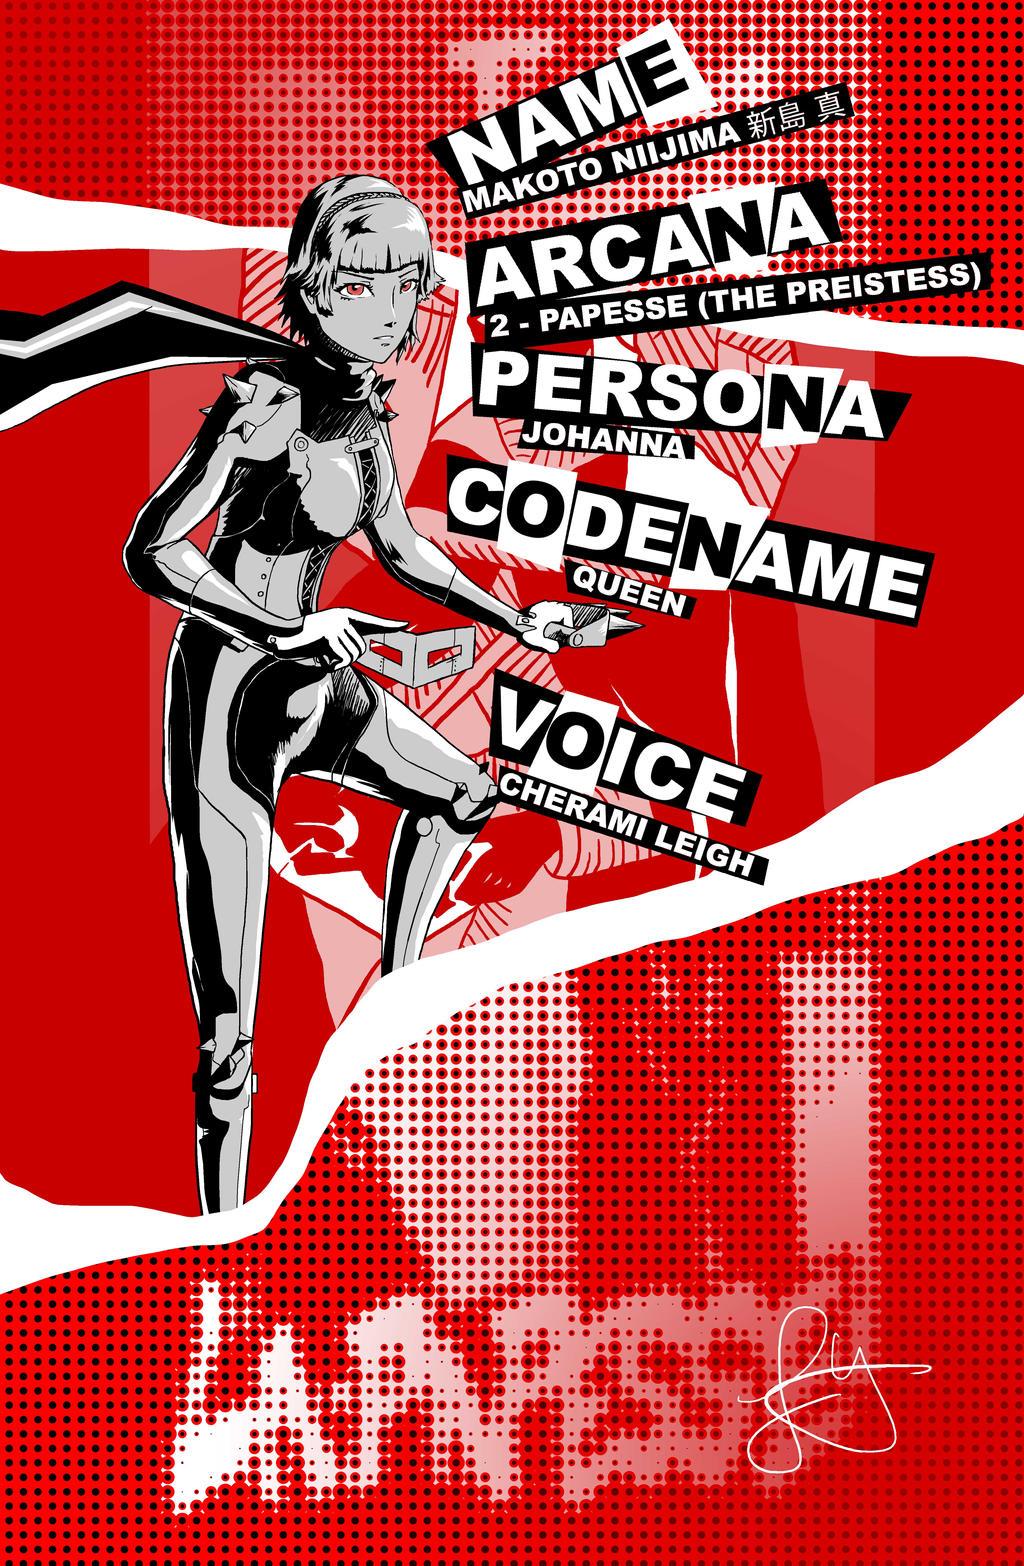 priestess persona 5